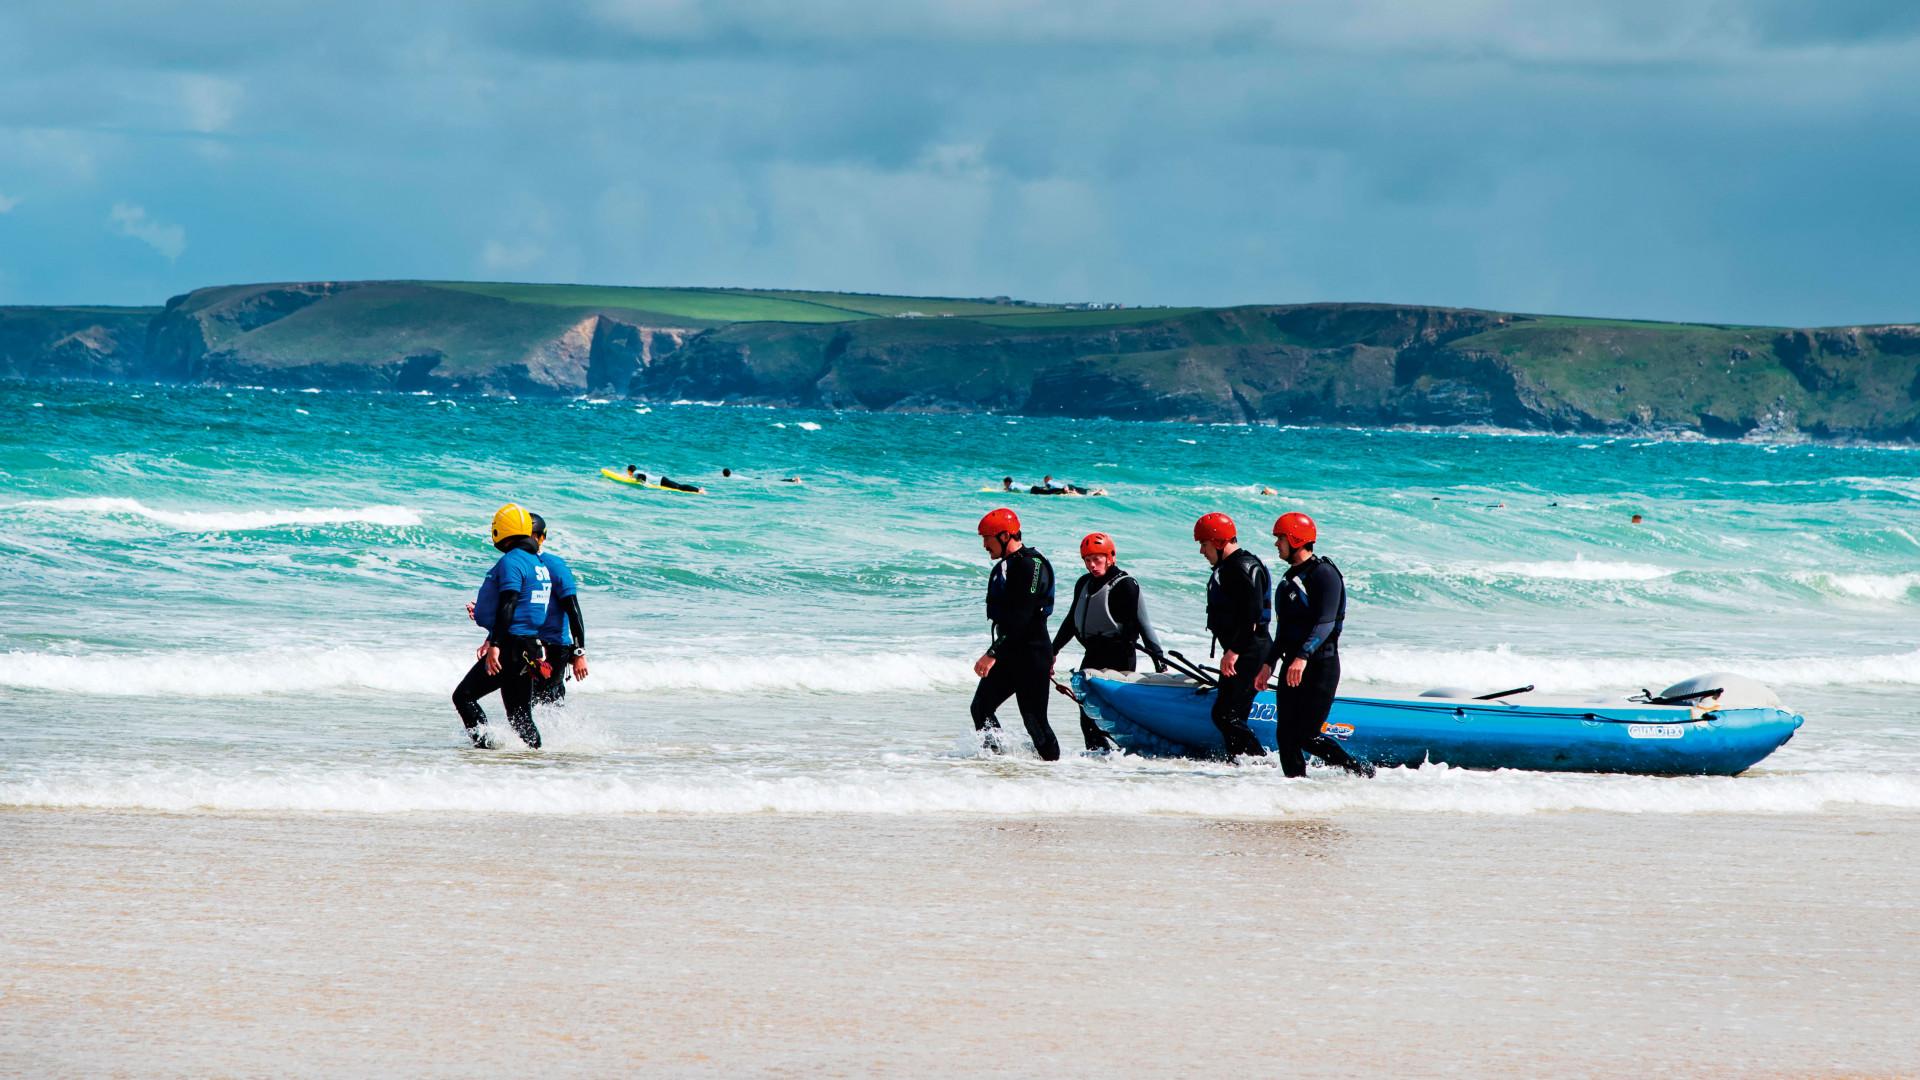 A group walk their raft into the Cornish sea